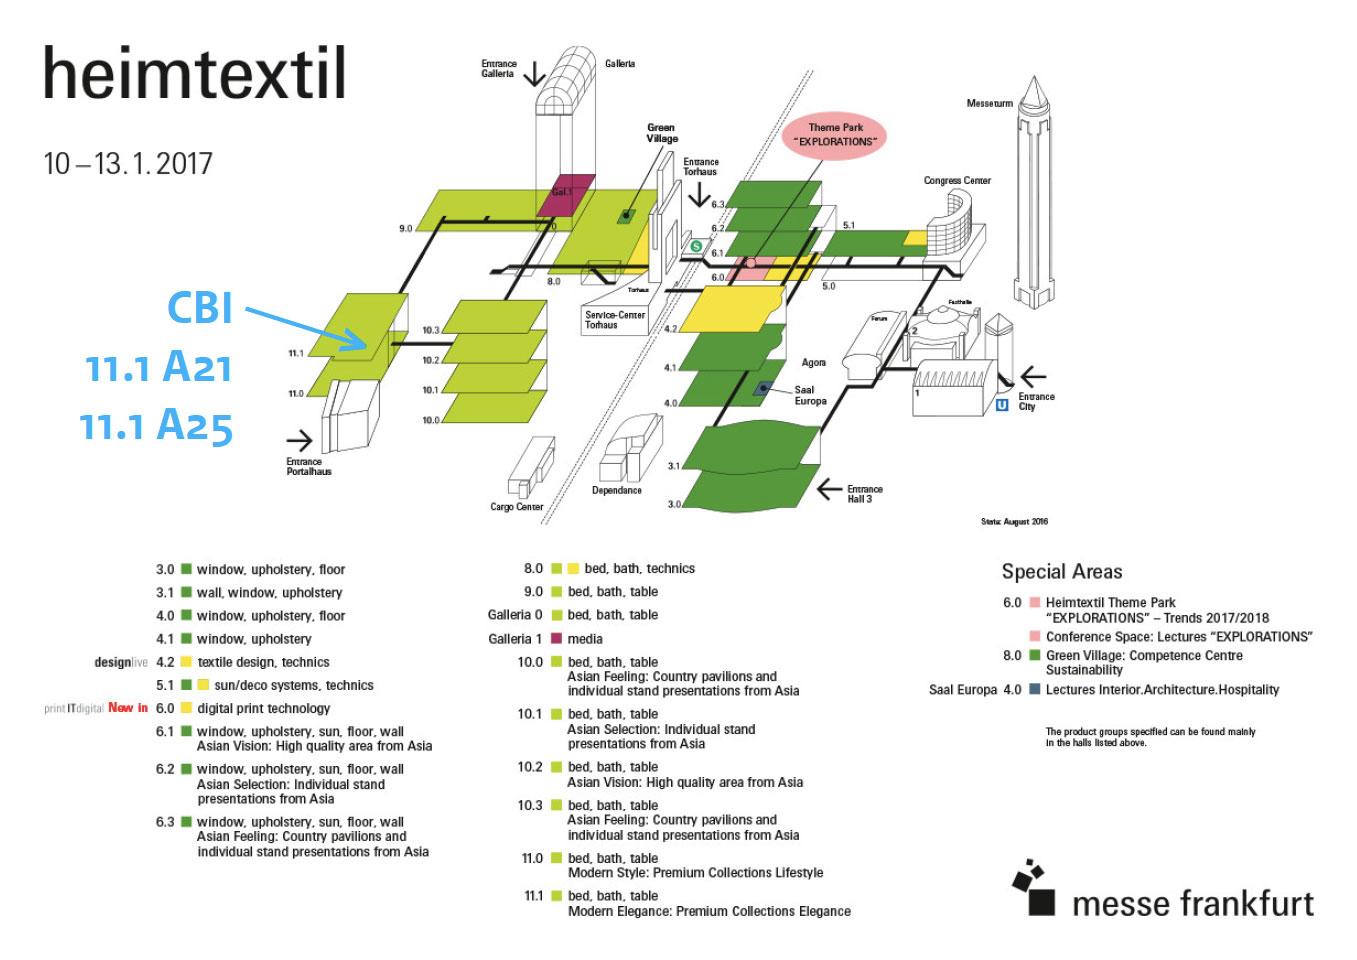 heimtextil 2017 floorplan